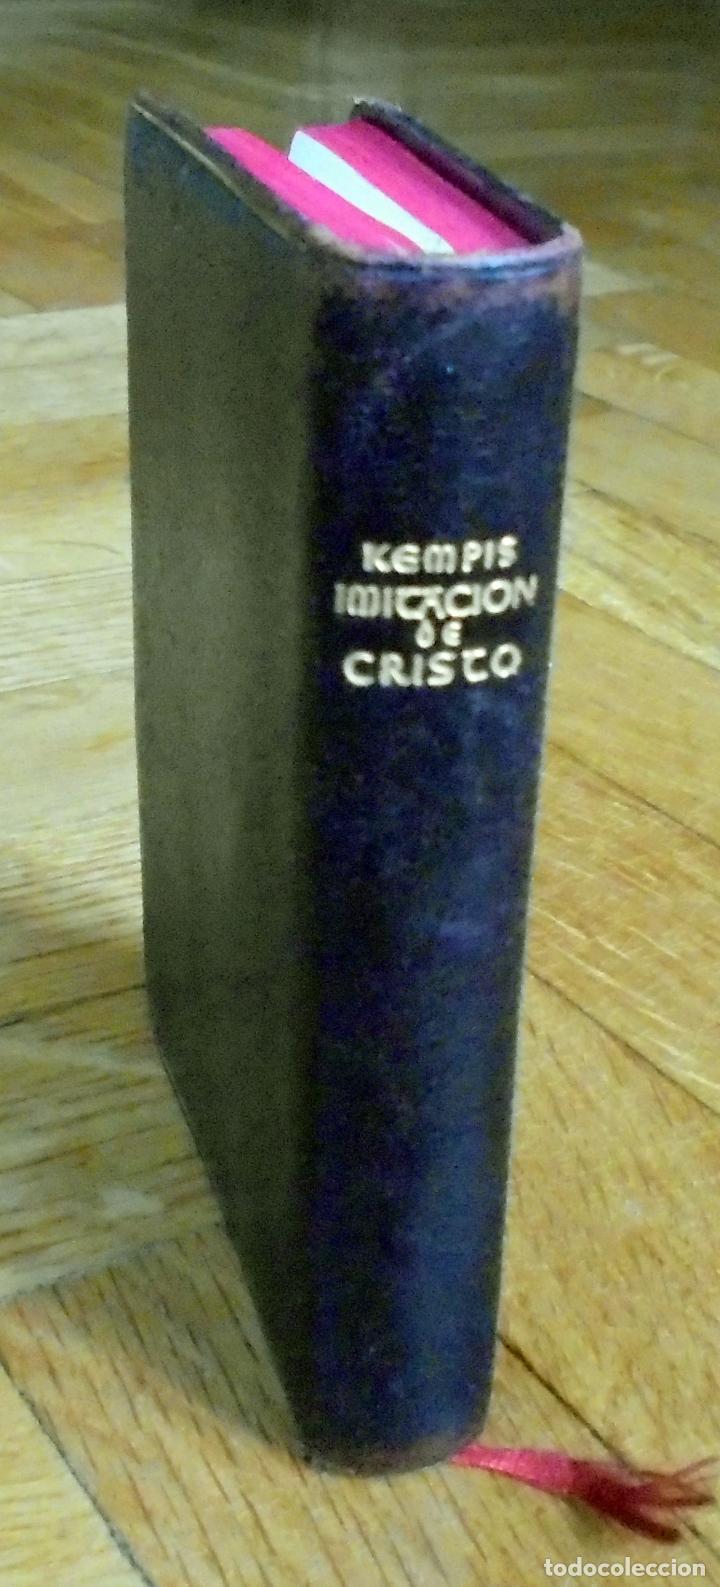 "CRISOL 57. ESPECIAL, OBRAS MORALES O RELIGIOSAS. EDICION ""B""- IMITACIÓN DE CRISTO, AGUILAR.1946 (Libros de Segunda Mano (posteriores a 1936) - Literatura - Narrativa - Otros)"